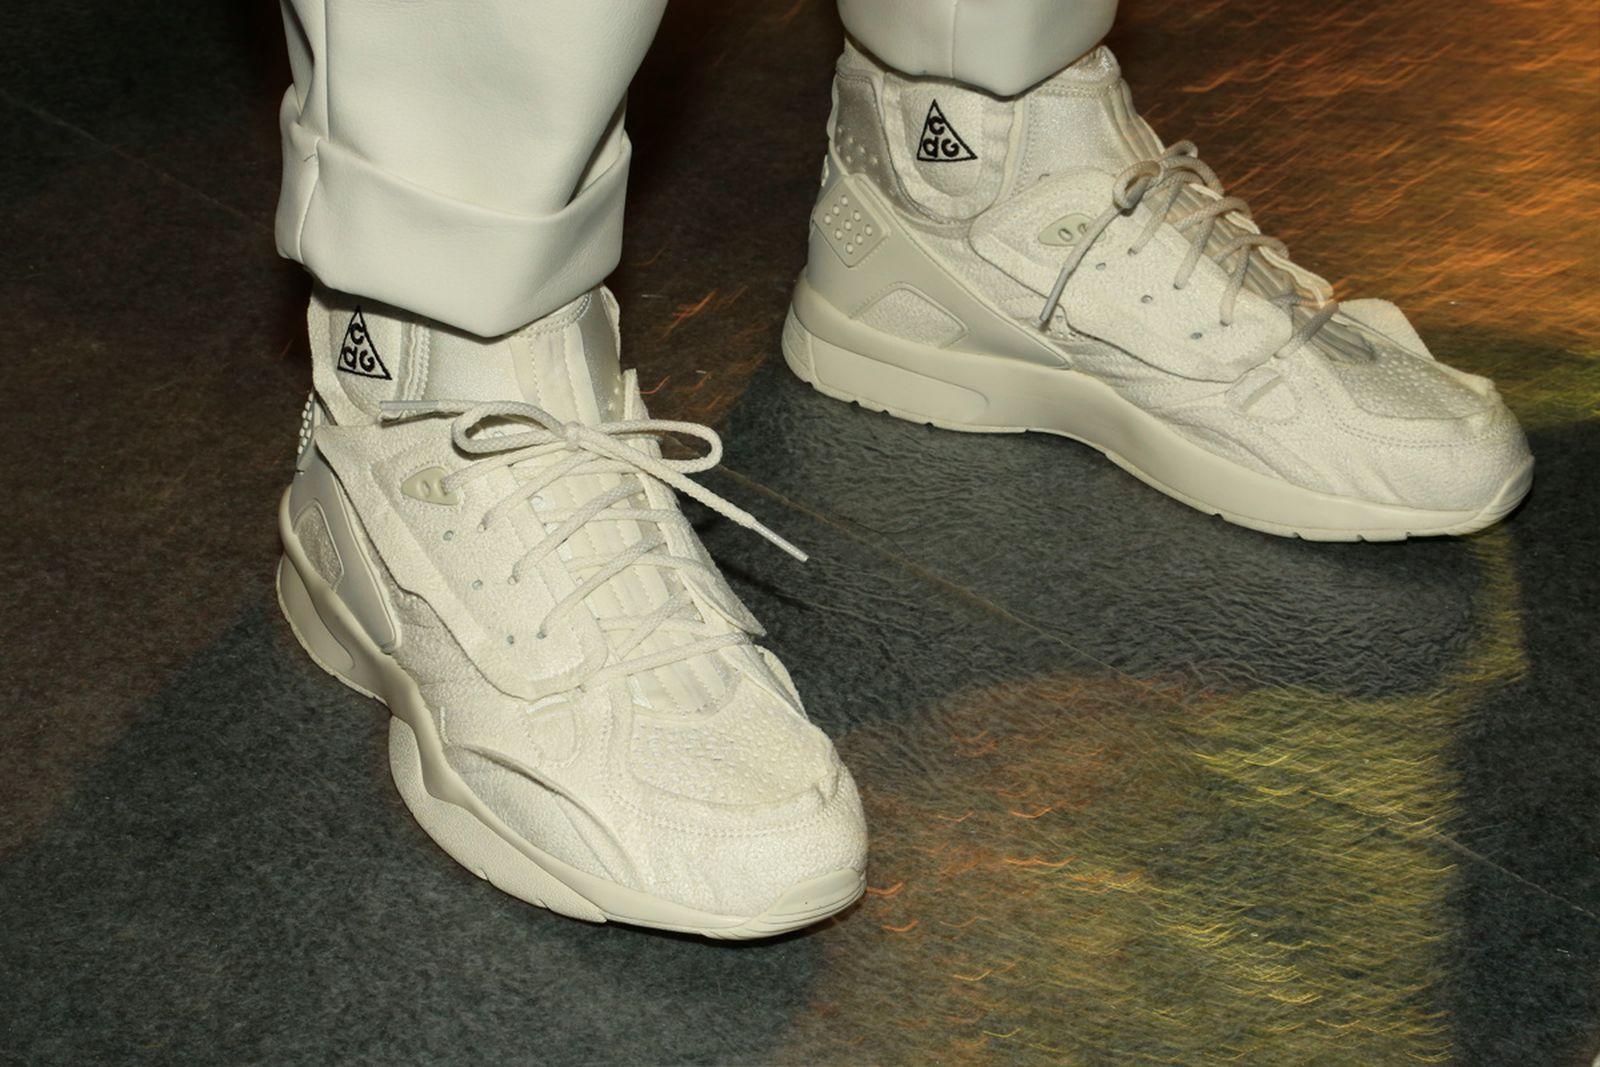 fw18 fashion week best sneakers CDG ACG 2Chainz Maison Margiela Nike